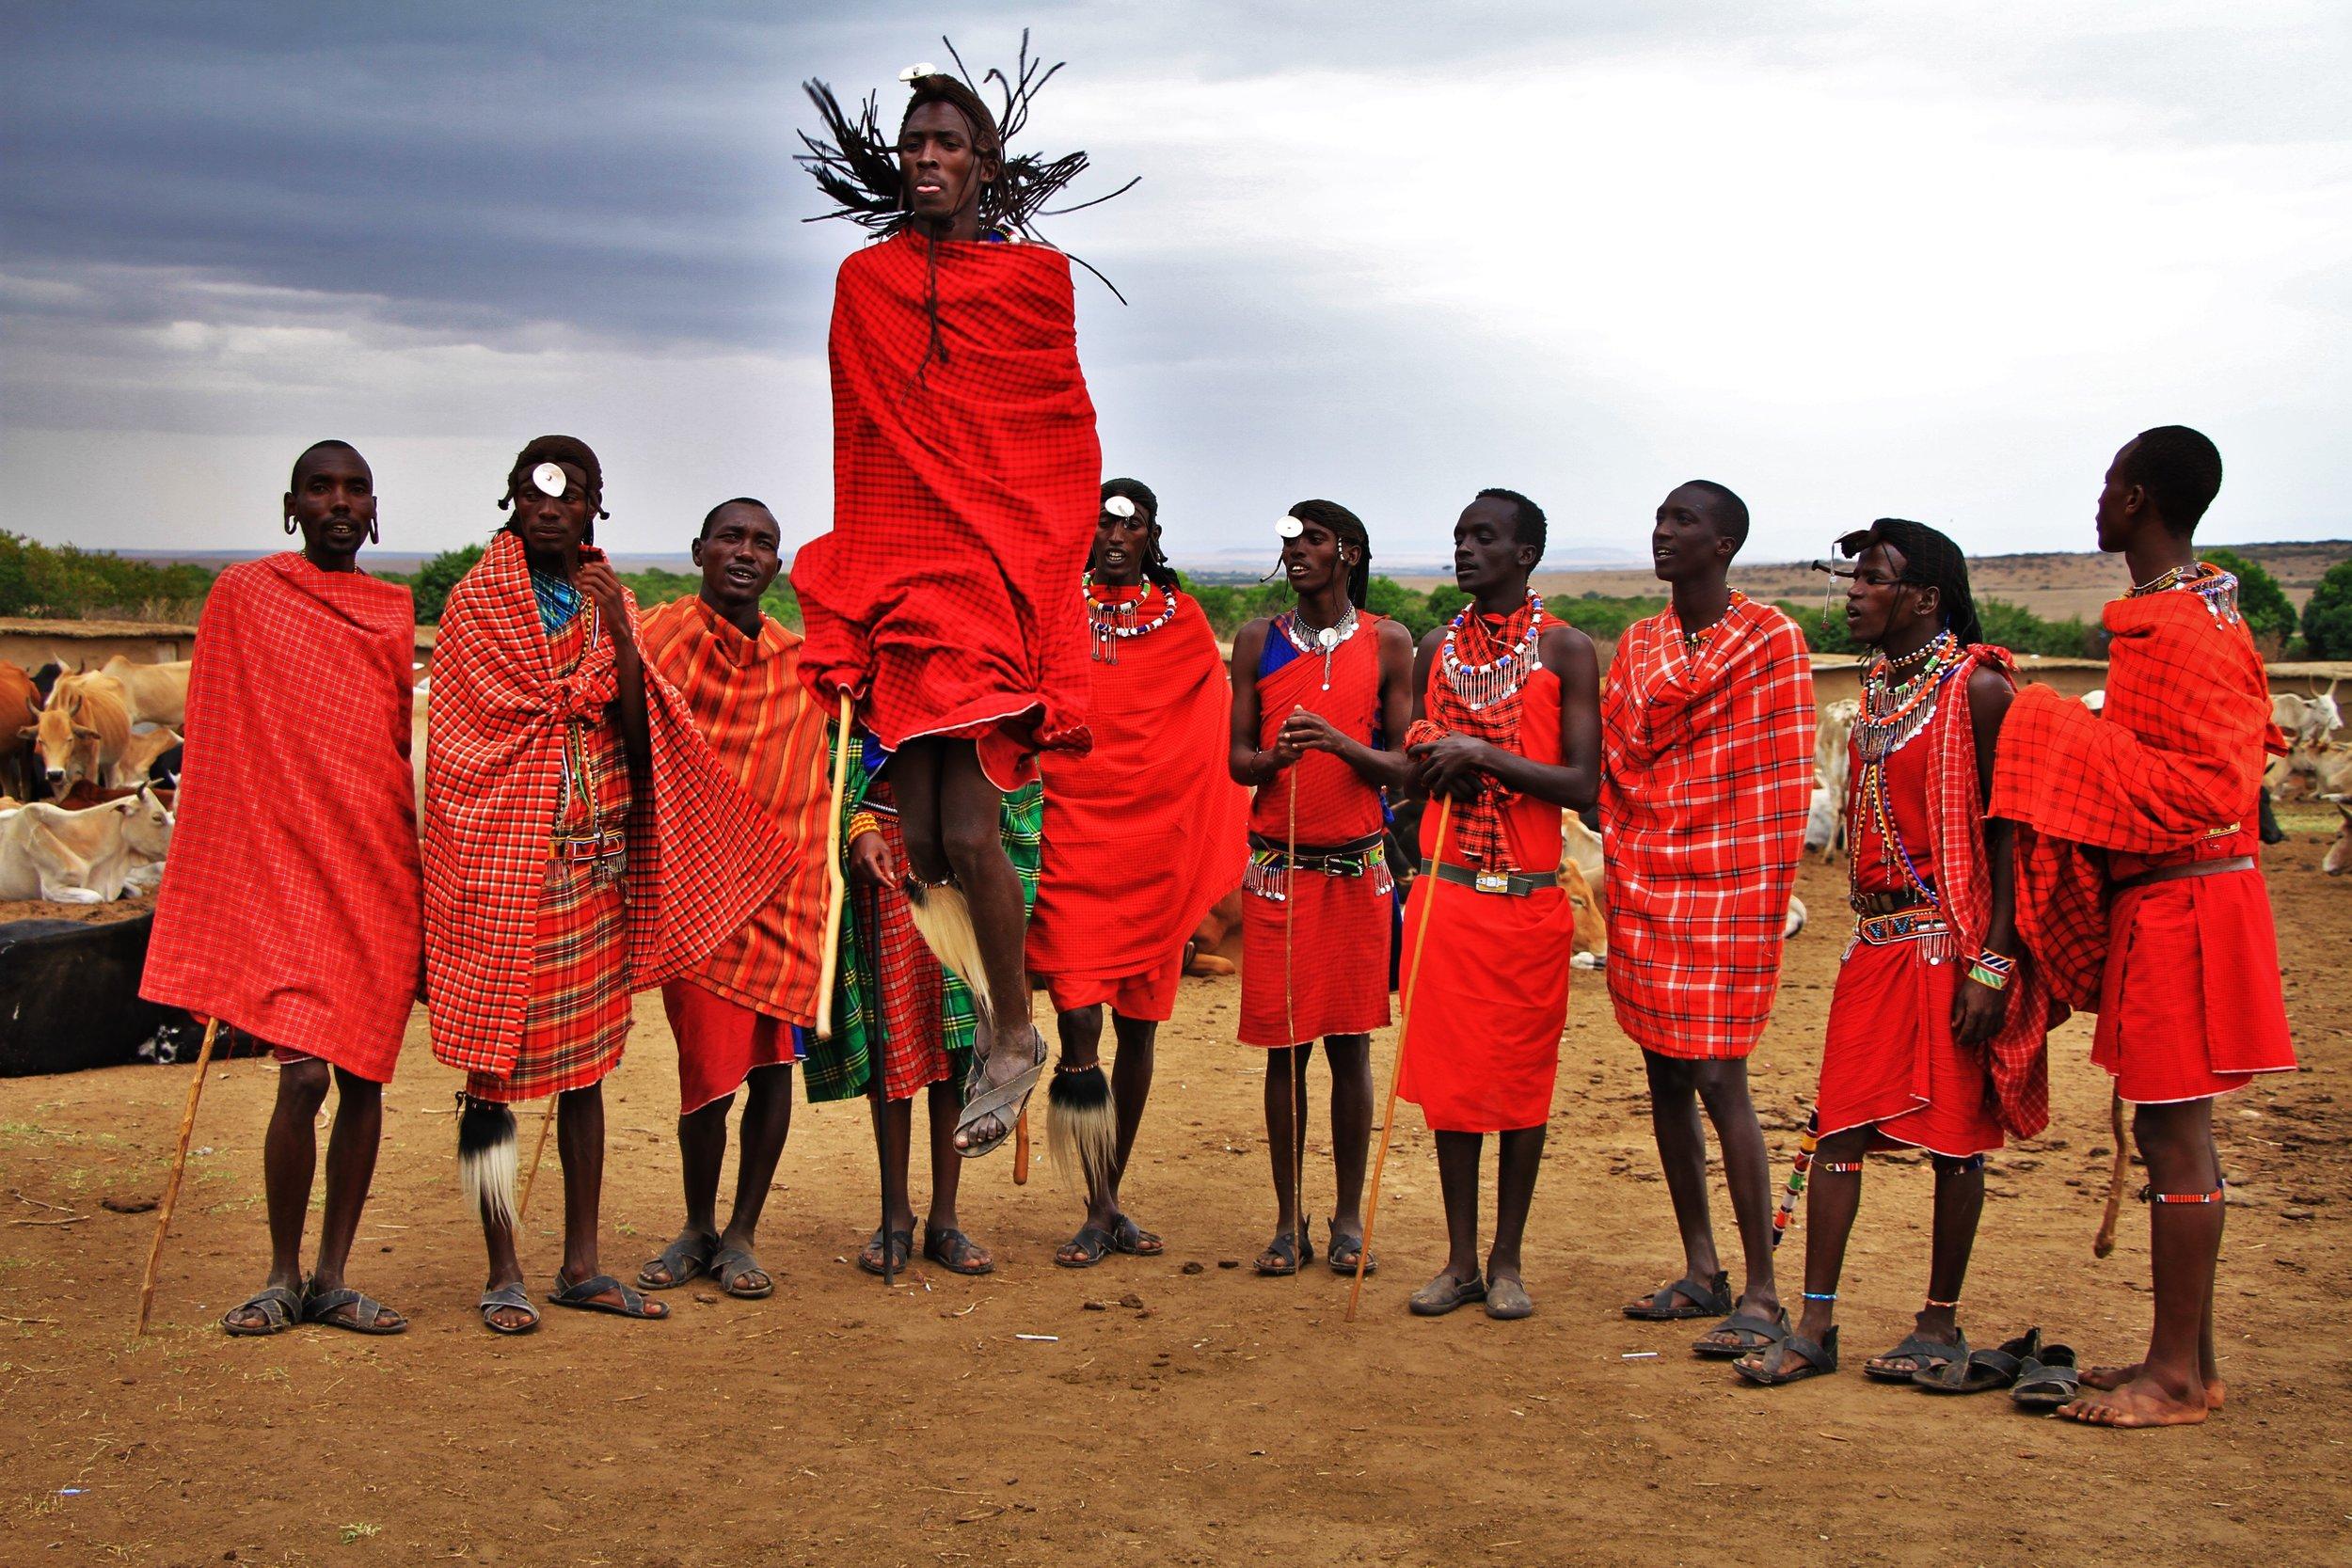 maasai tribesmen jumping.jpg